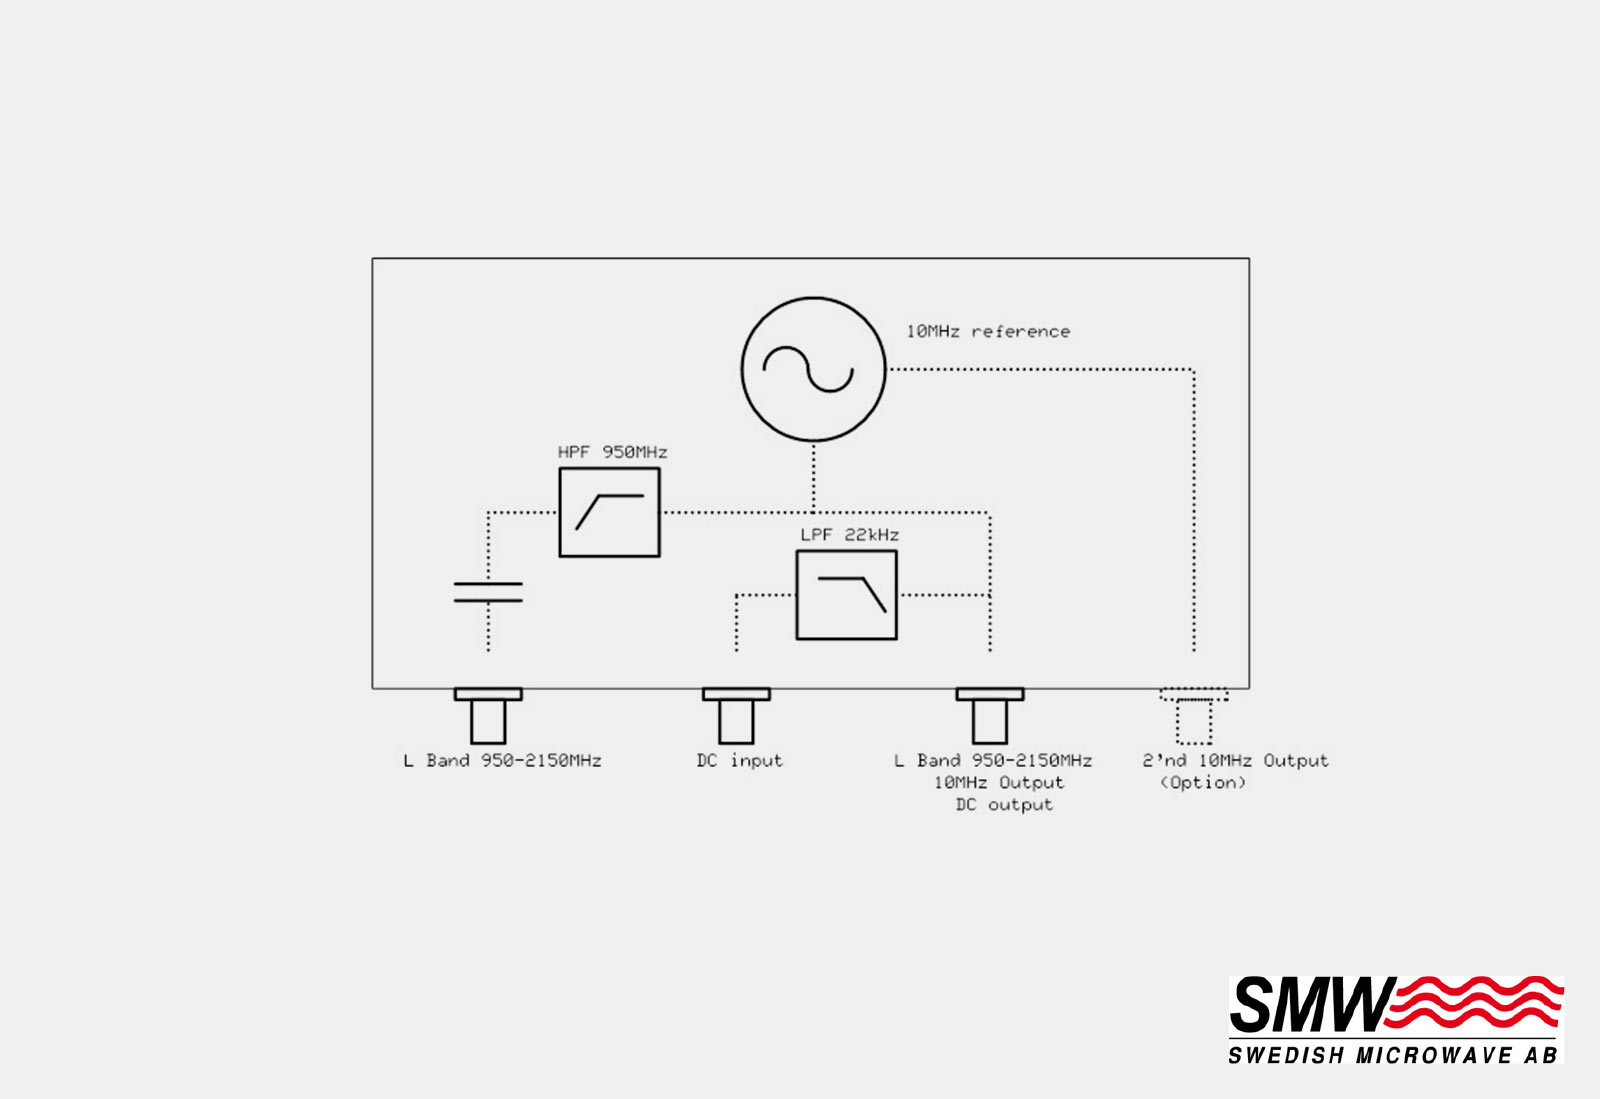 Swedish Microwave Ab Smw 10 Mhz Reference Oscillator